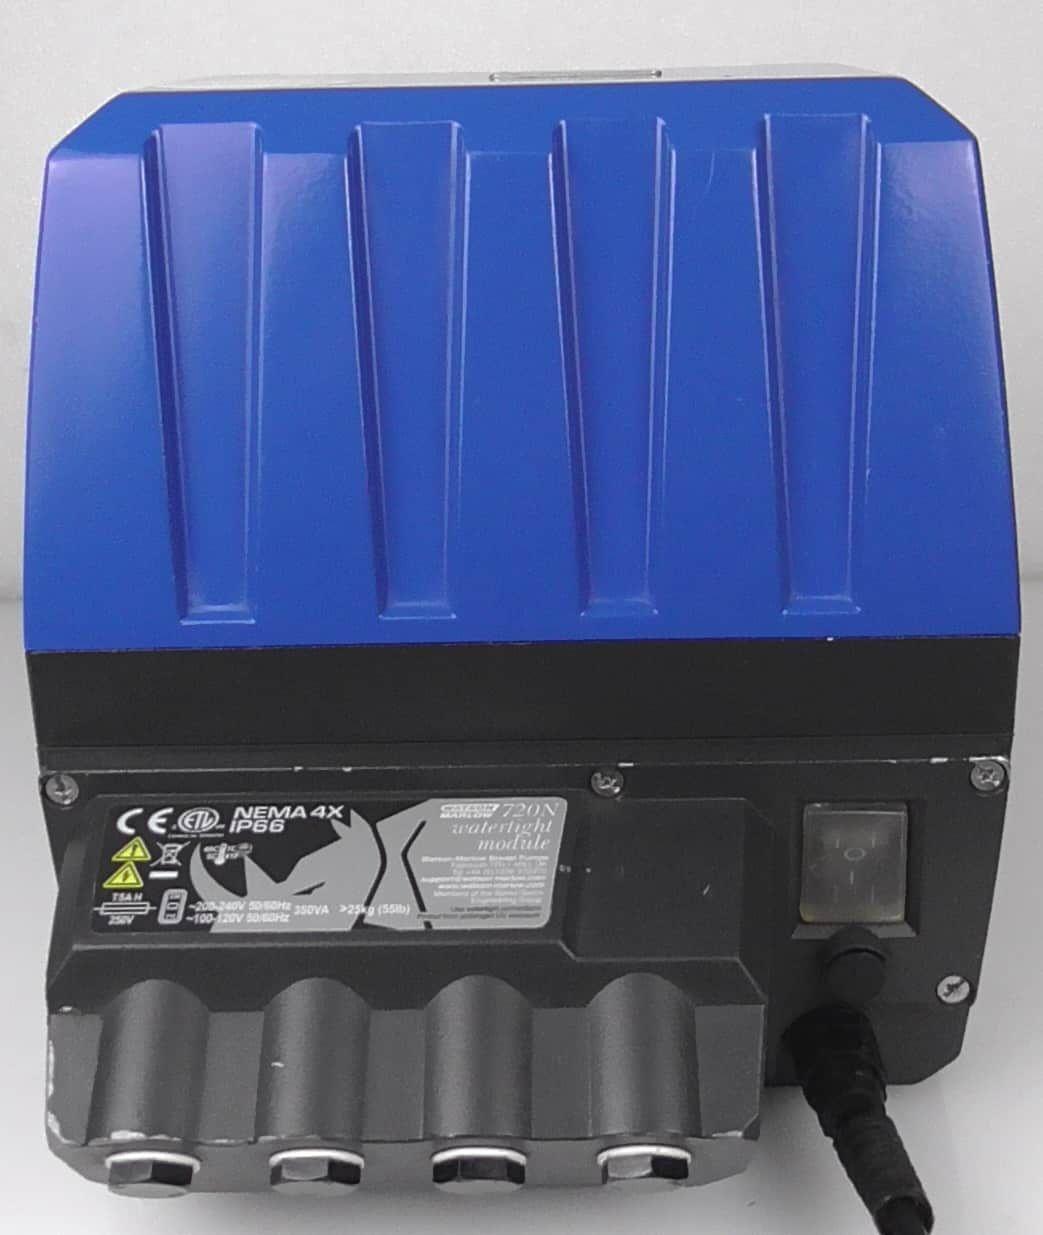 Watson Marlow 720SN/RE IP66 Peristaltic Pump for Sale